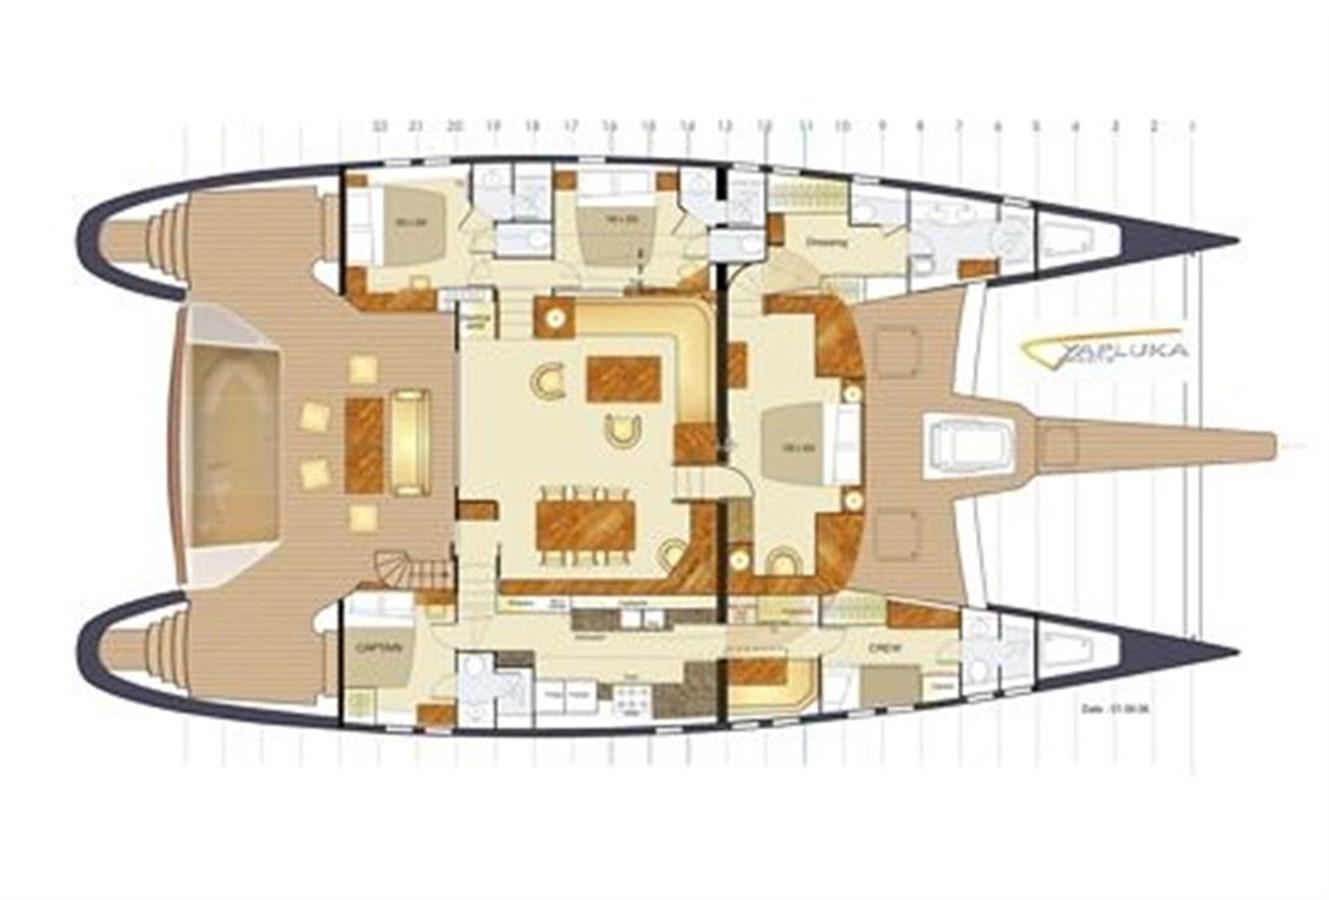 Layout 2008 YAPLUKA 85 Double Deck Catamaran 86952